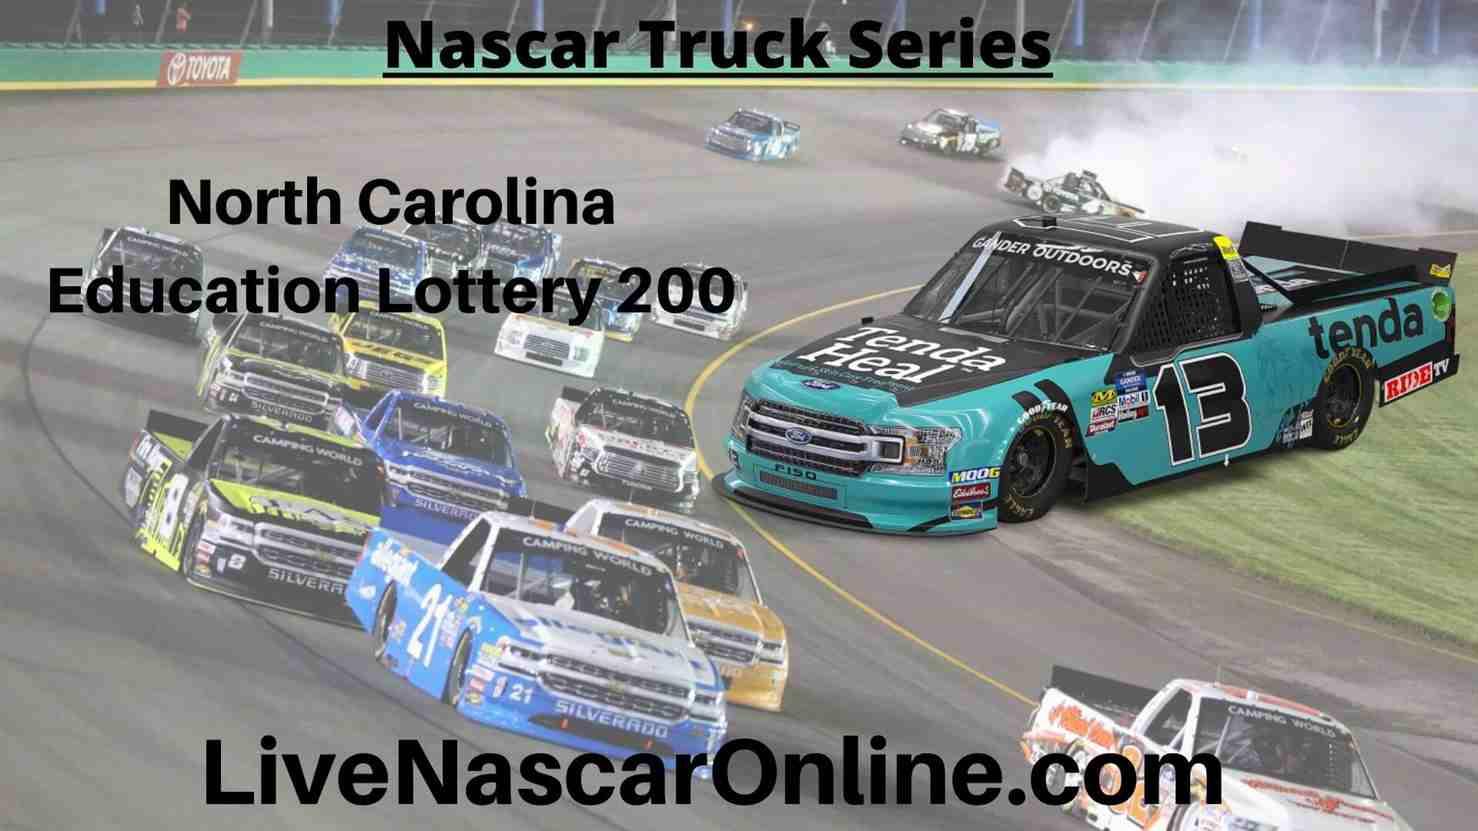 North Carolina Education Lottery 200 Online Stream | NASCAR Charlotte 2020